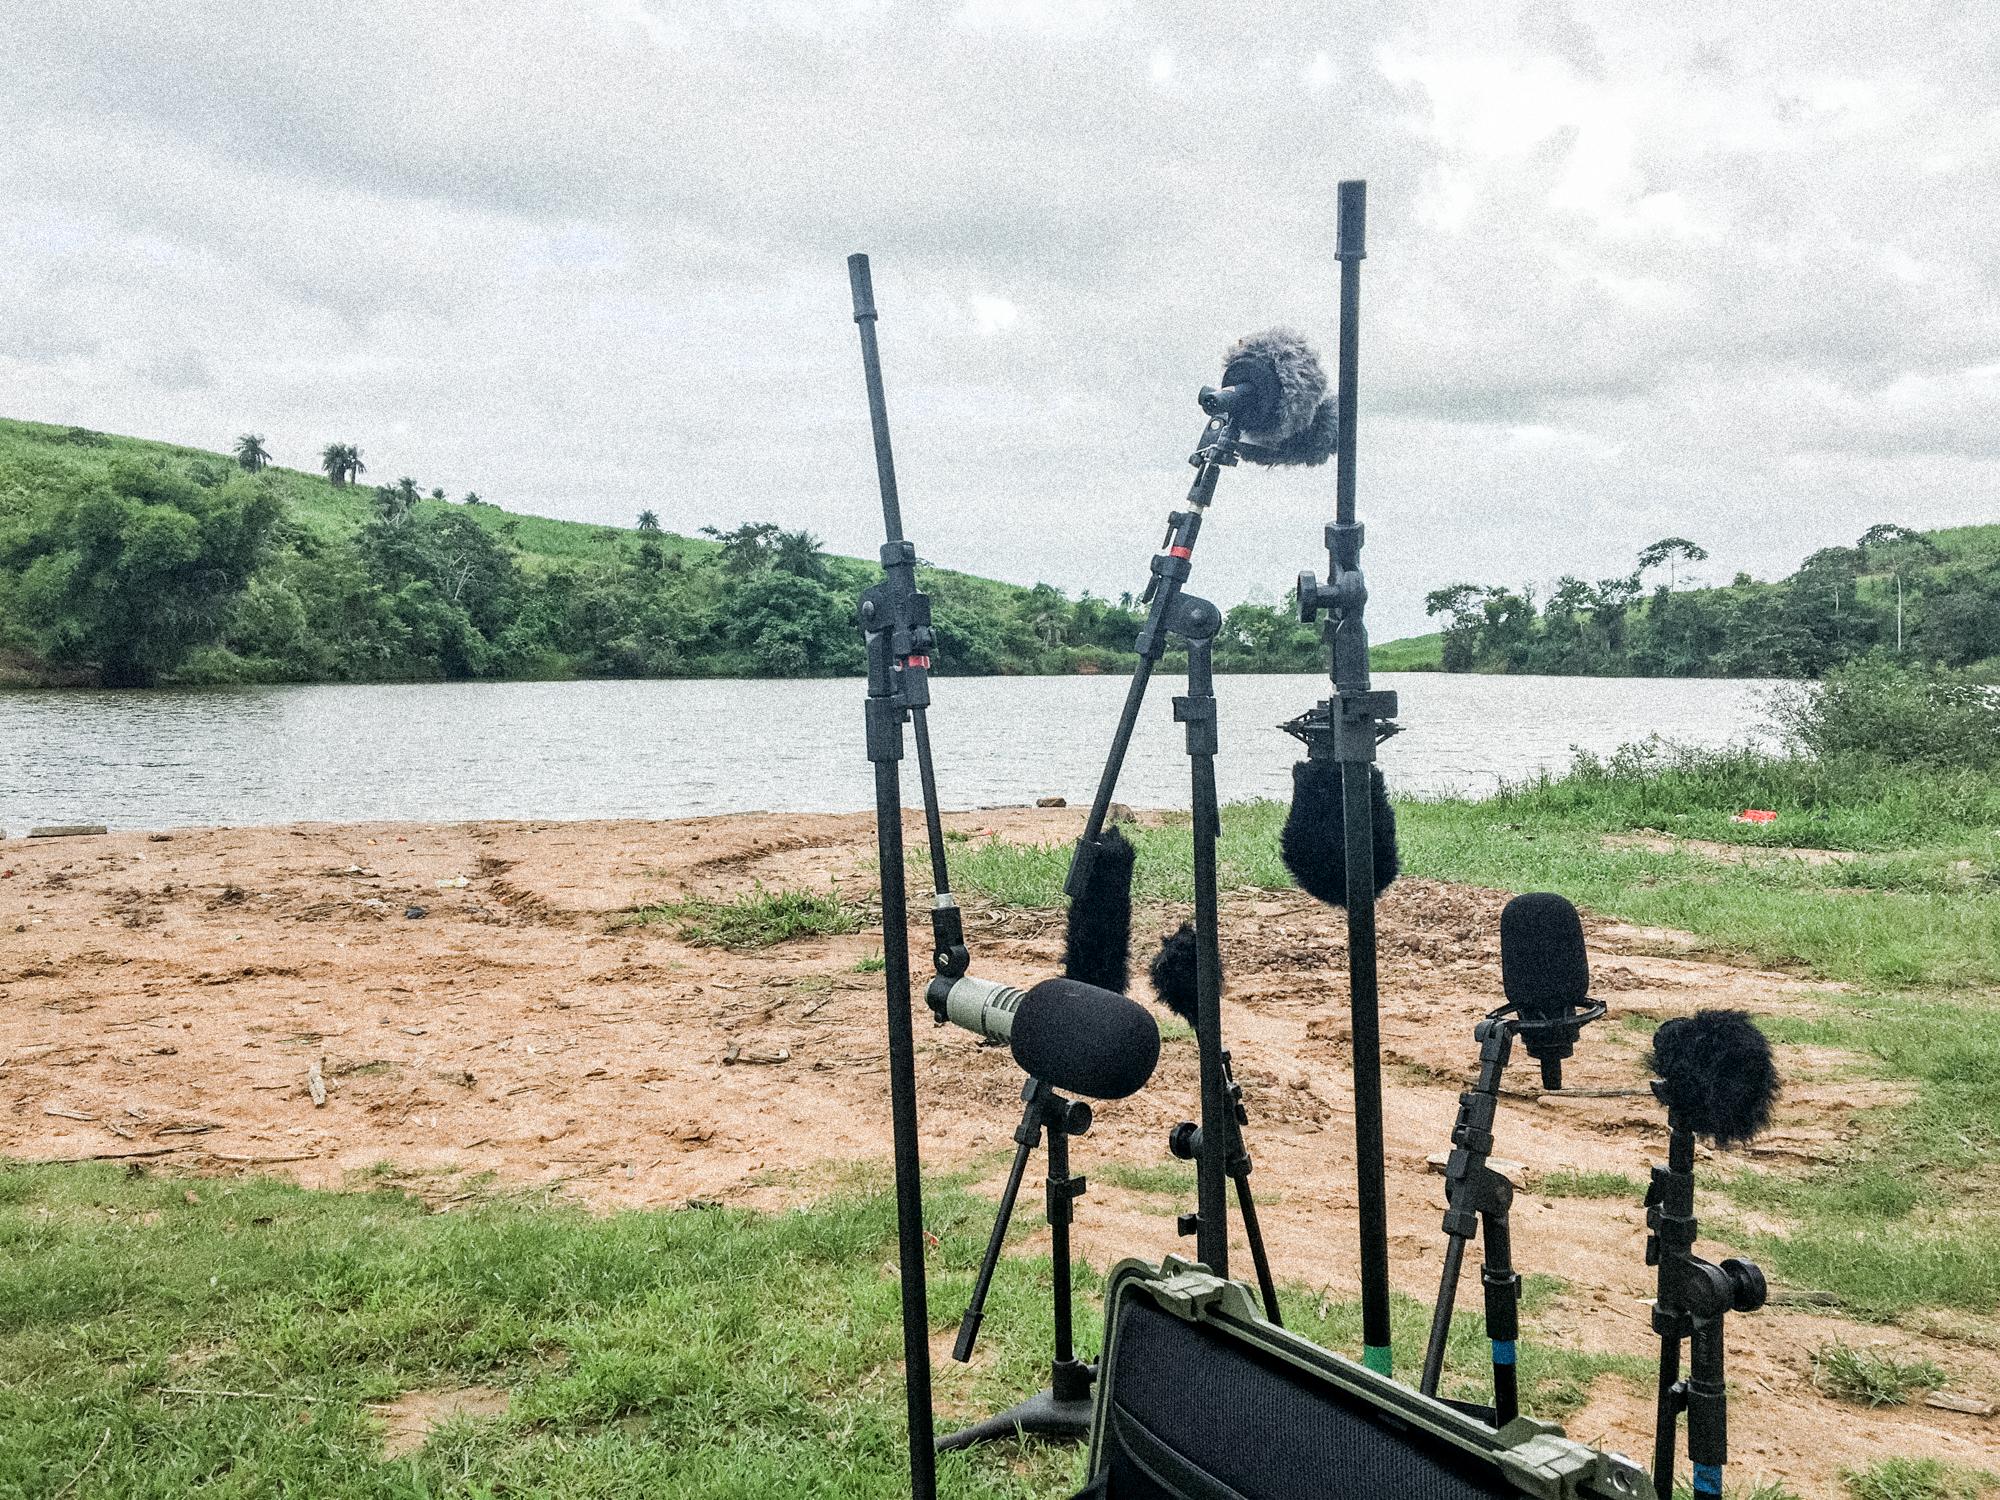 2016.02.24 - Condado - Maracatu Rural (Tyler iPhone 6S)_06 - LR (JPG 1500px 72 DPI).jpg